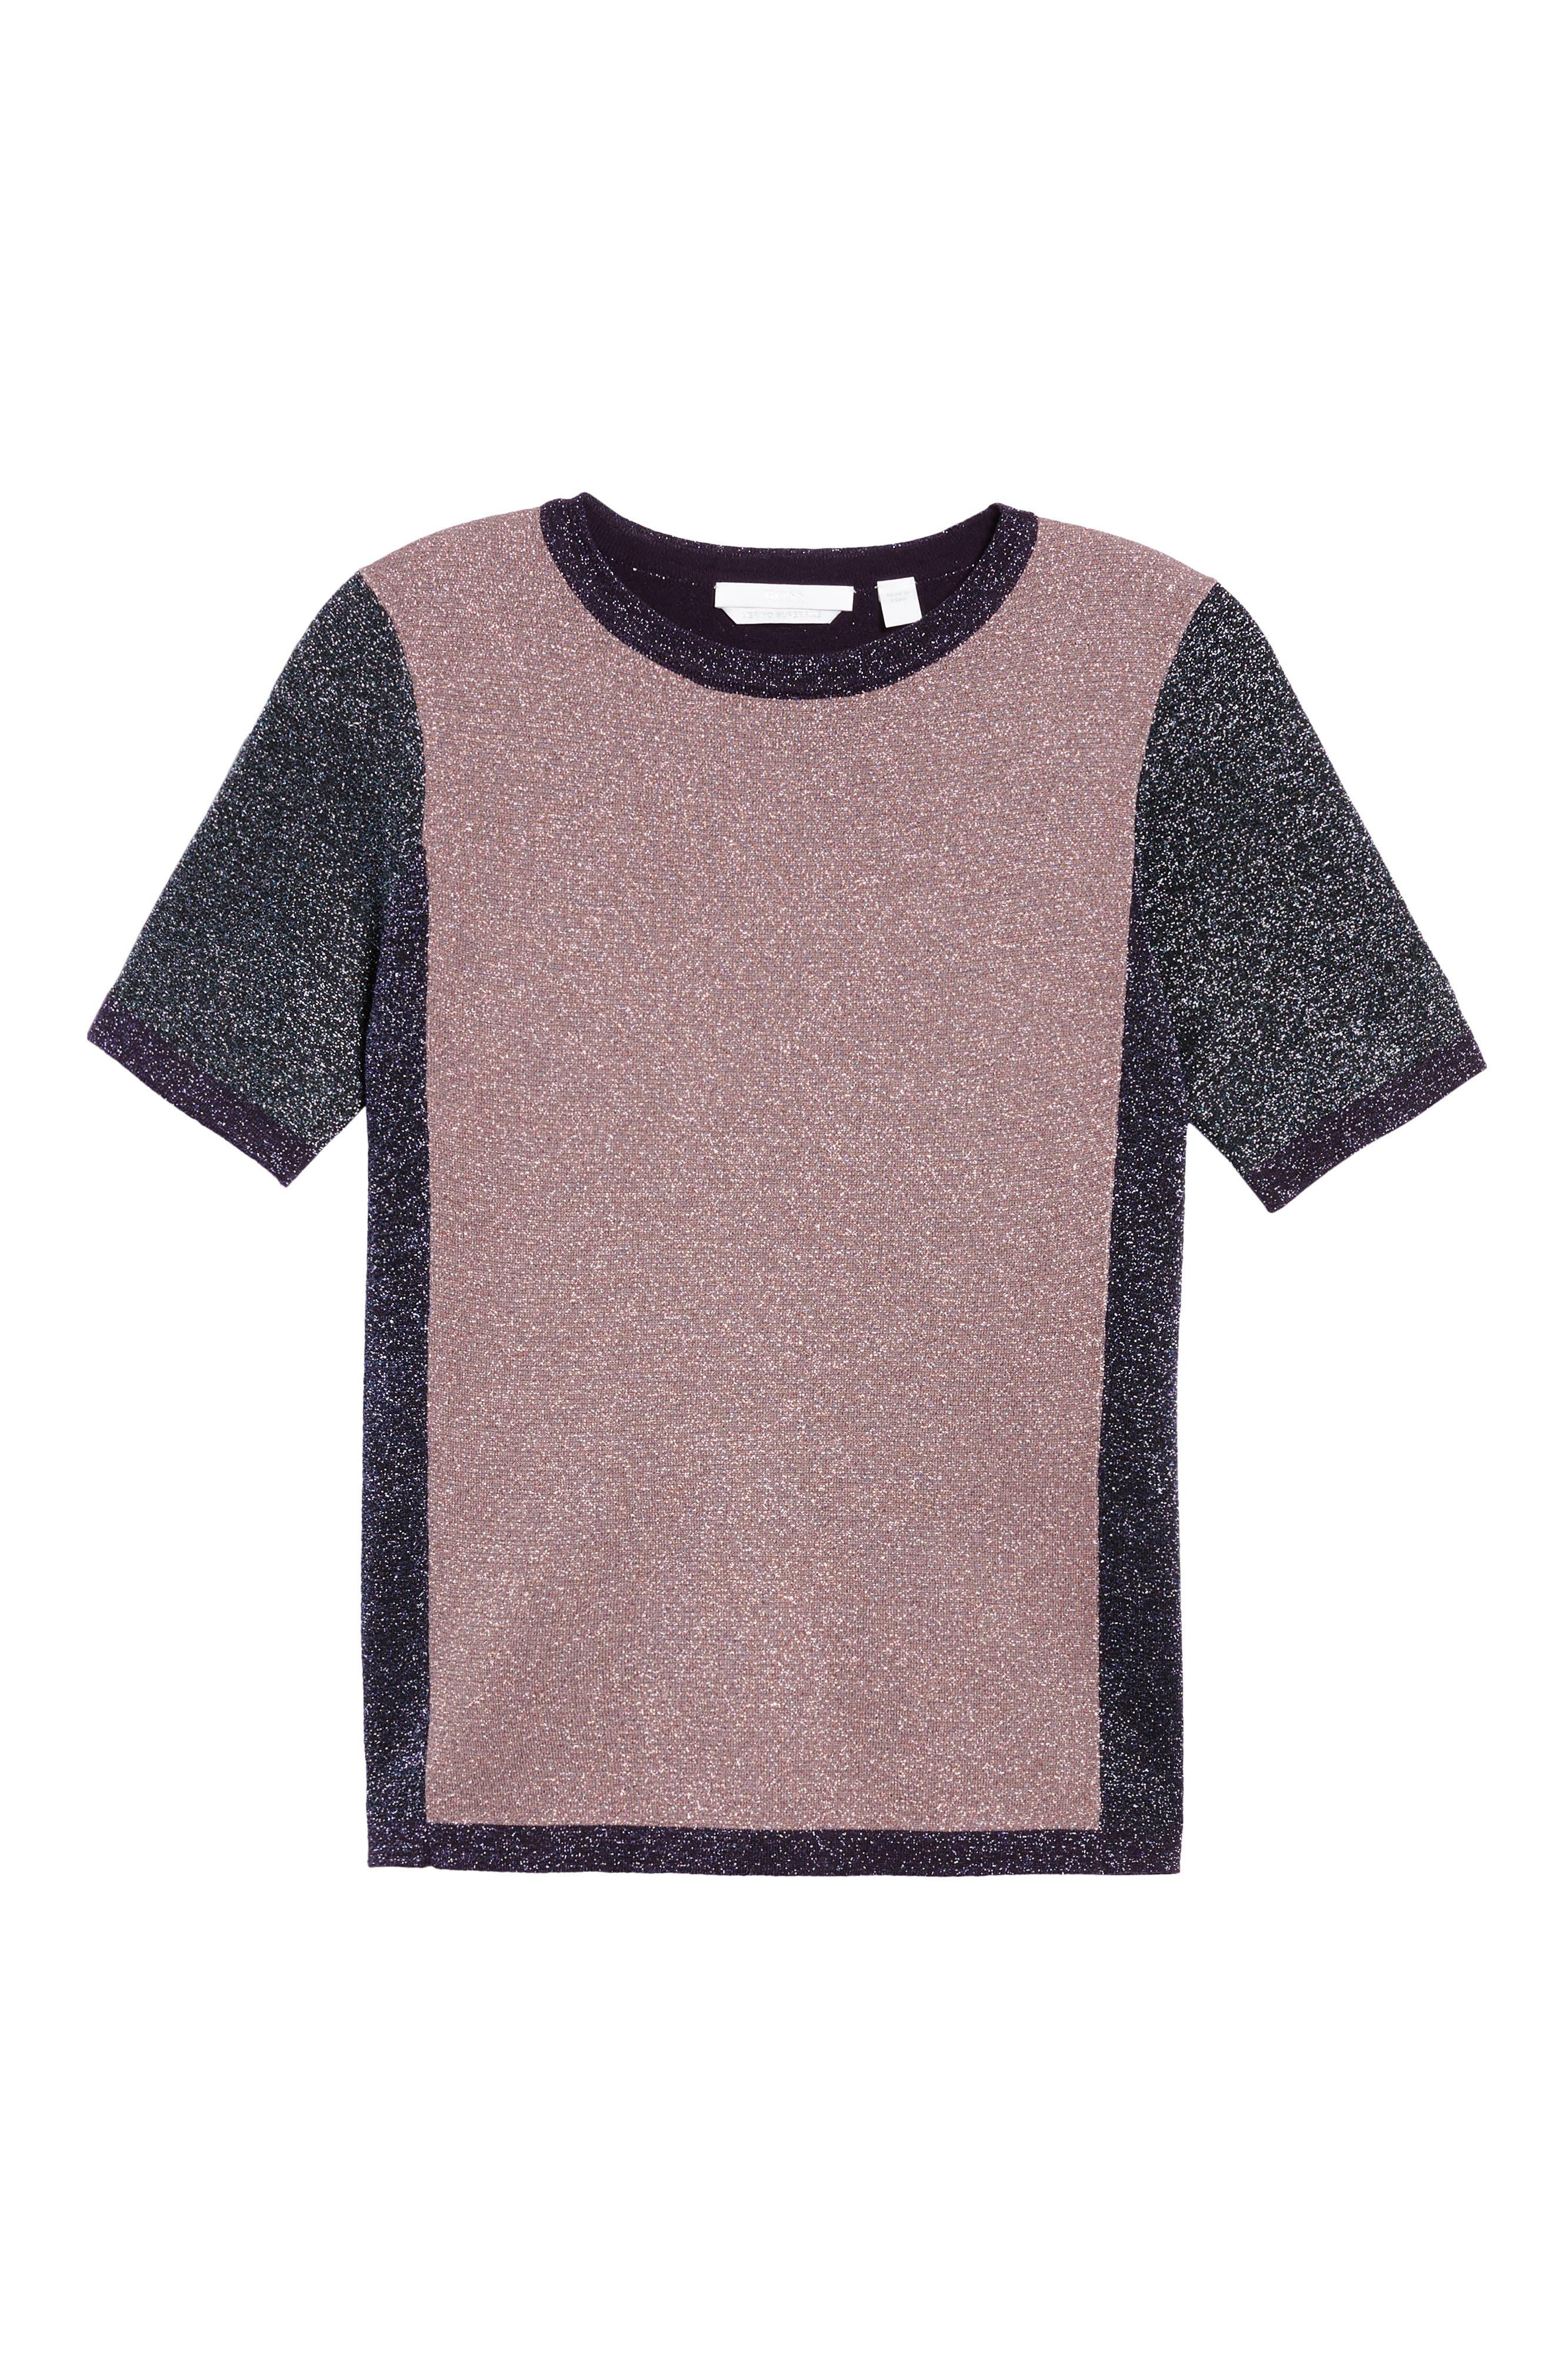 Fifer Sweater,                             Alternate thumbnail 6, color,                             674